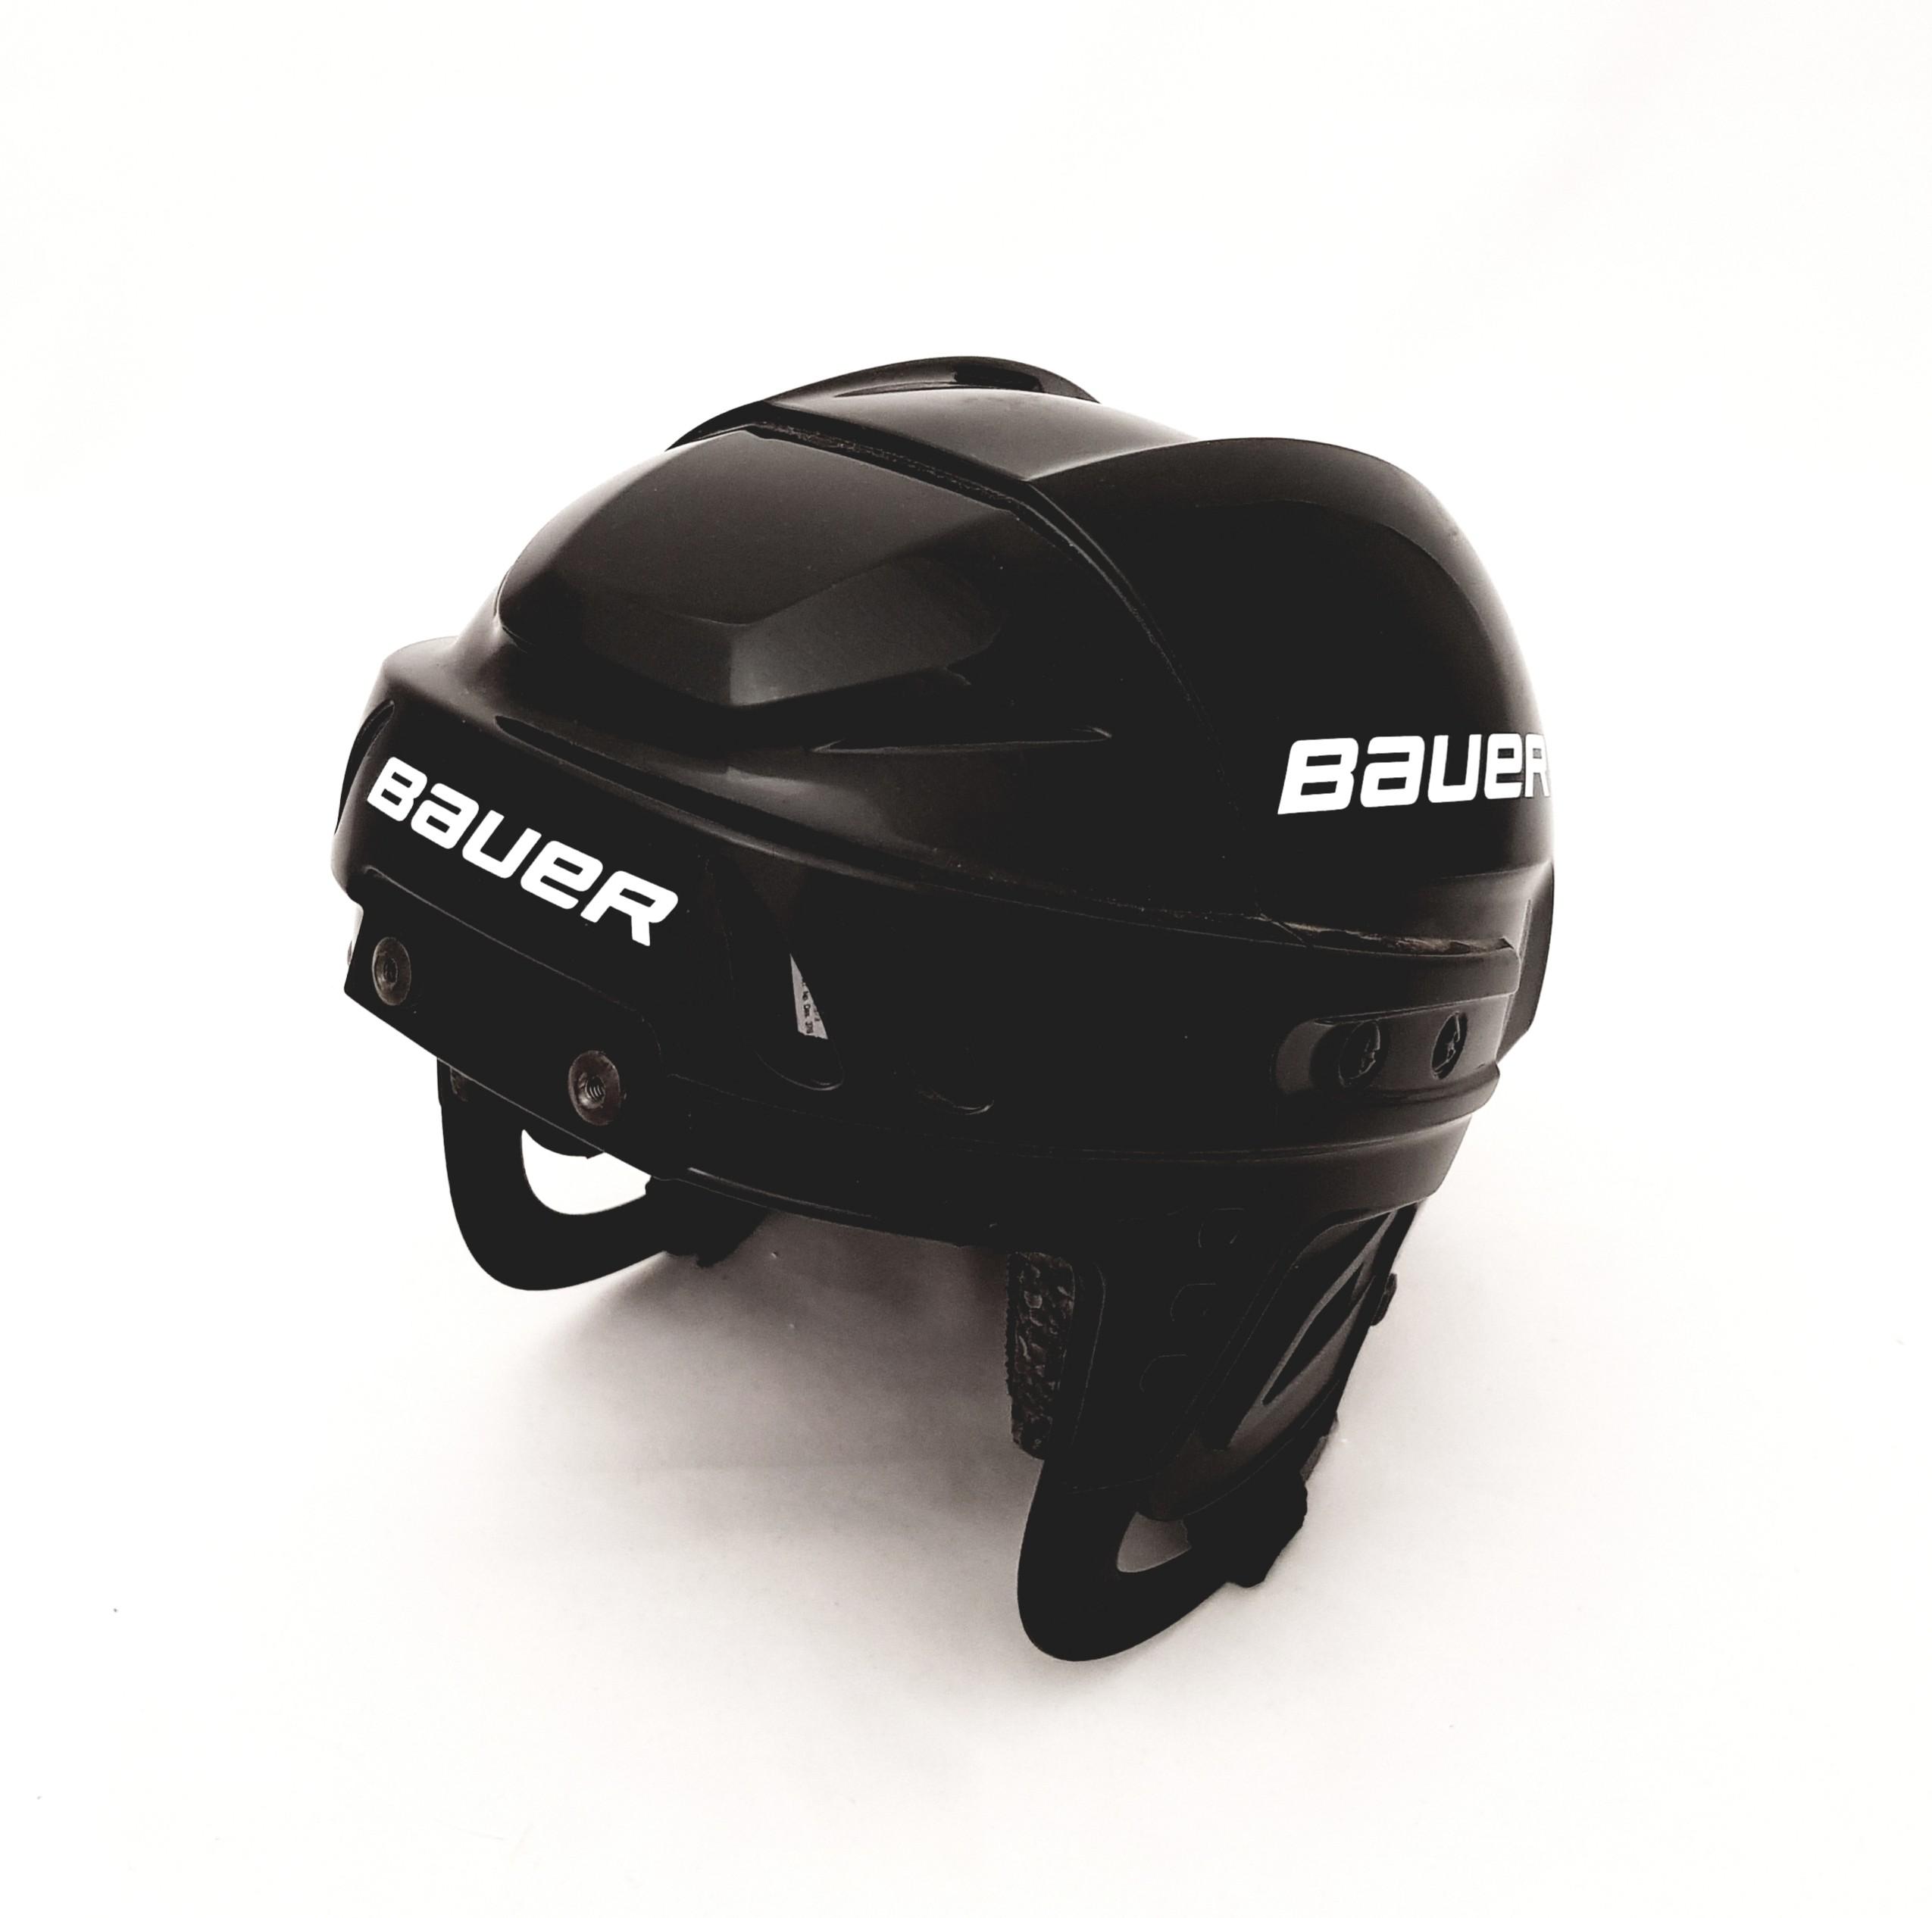 Bauer M-10 Hockey Helmet